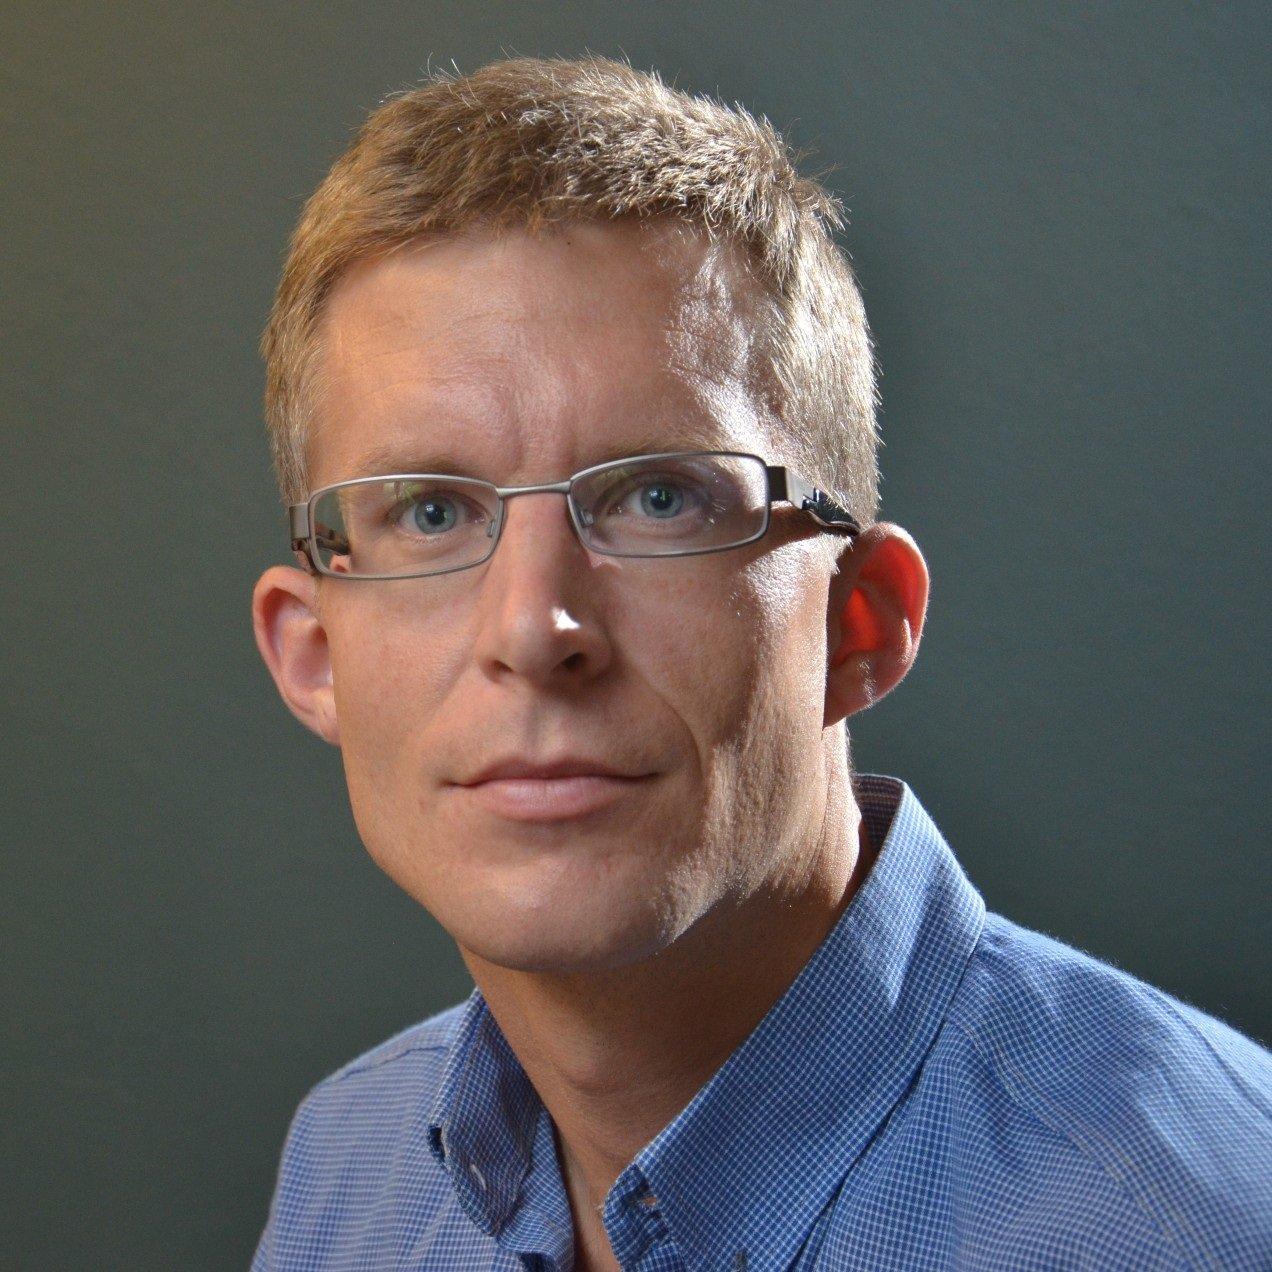 Joseph Neary - Researcher